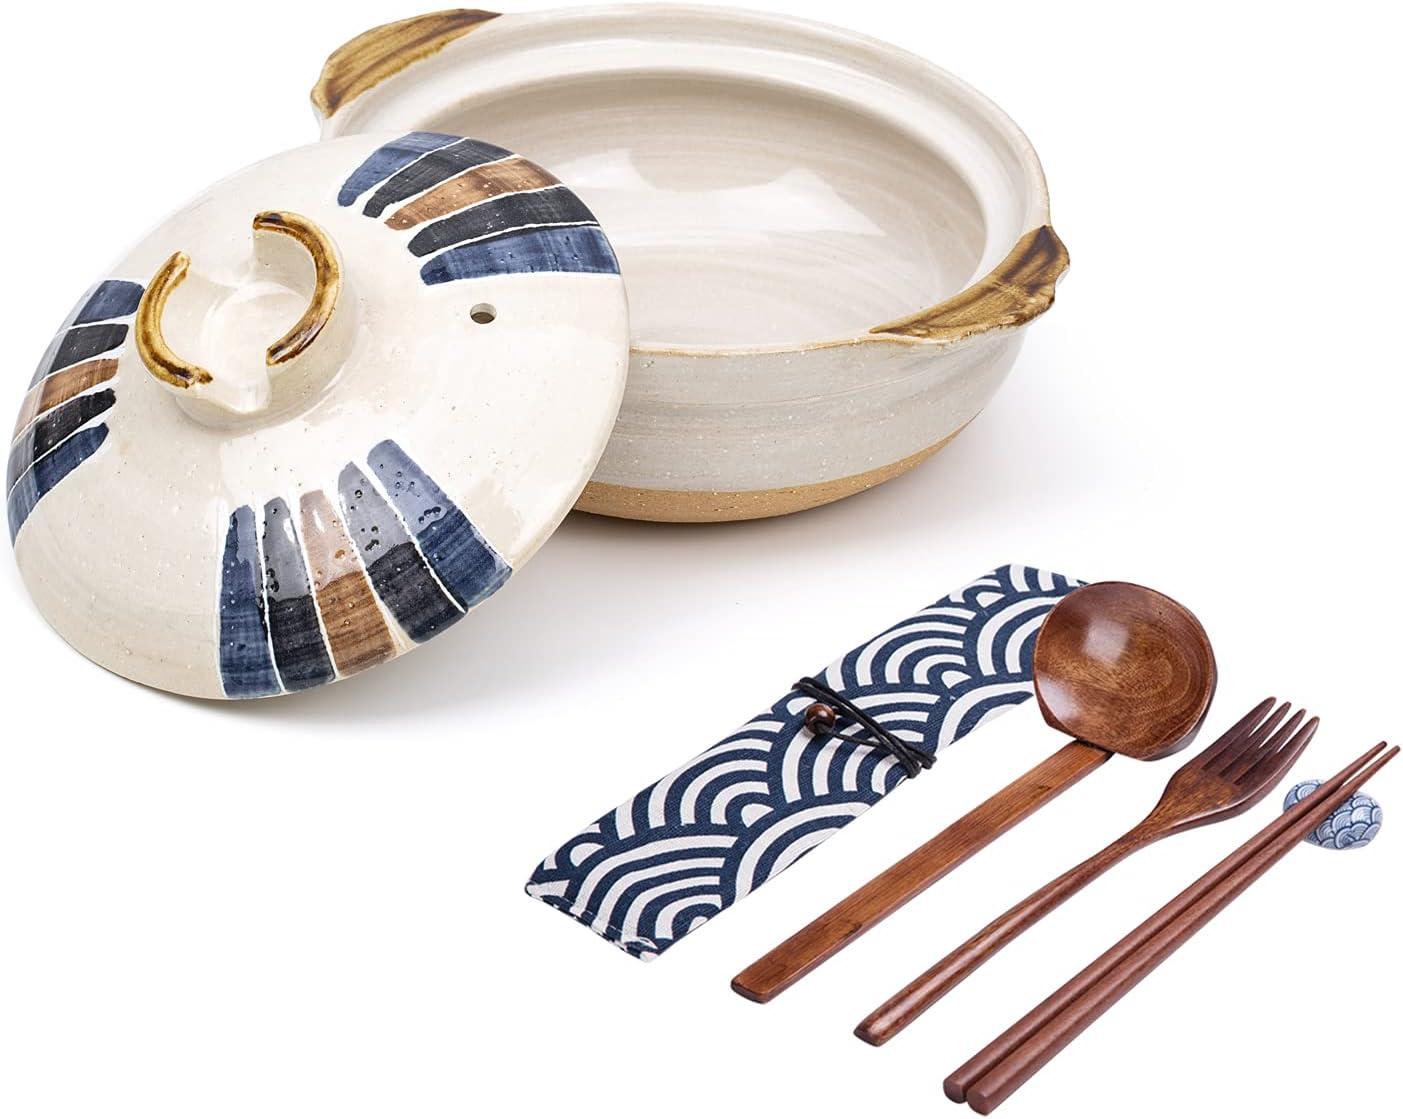 Ceramic Ramen Bowl Set with Las Vegas Mall Finally resale start Lid Noodl Chopsticks Spoons 30oz